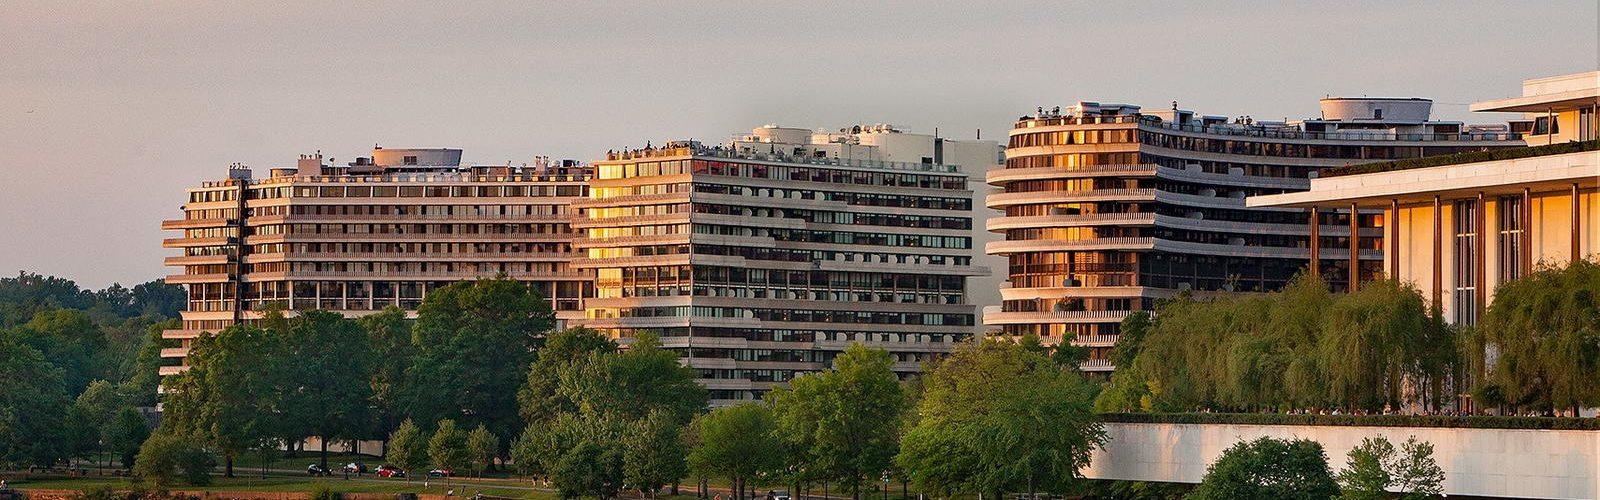 hotel-watergate-lieu-clef-scandale-president-etats-unis-une